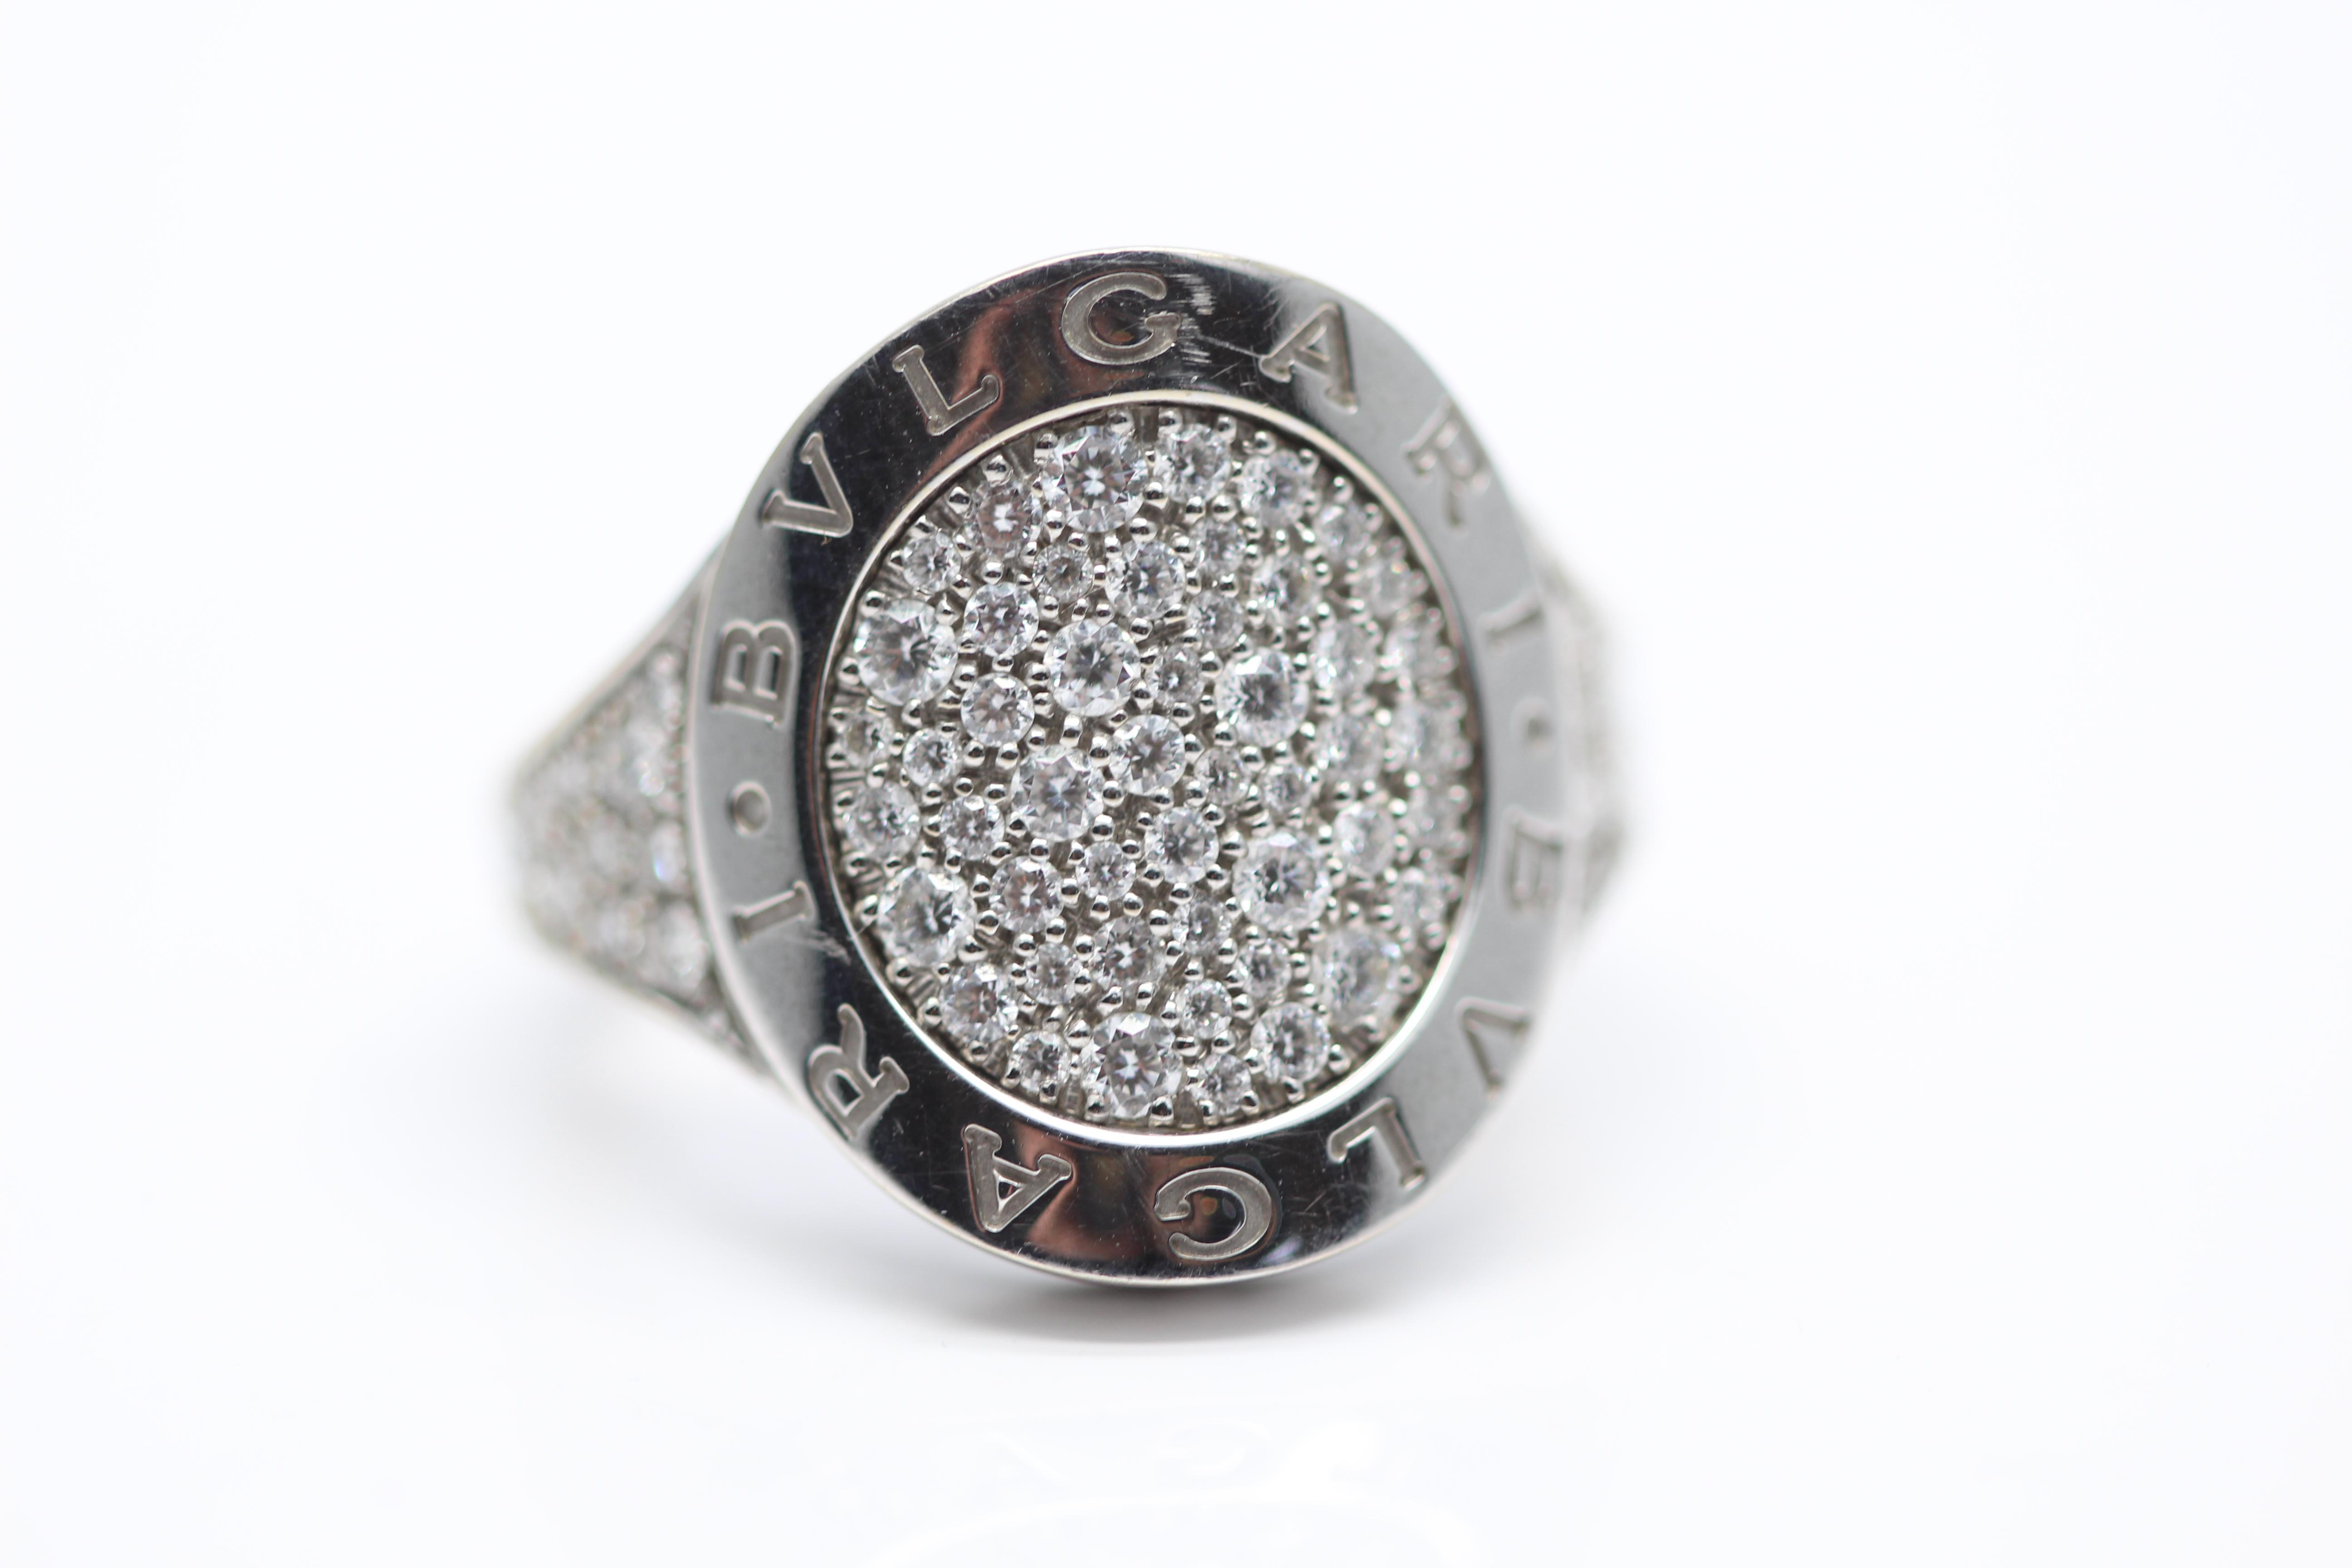 4250 18CT WHITE GOLD BVLGARI DIAMOND RING INCLUDES RECEIPT FOR